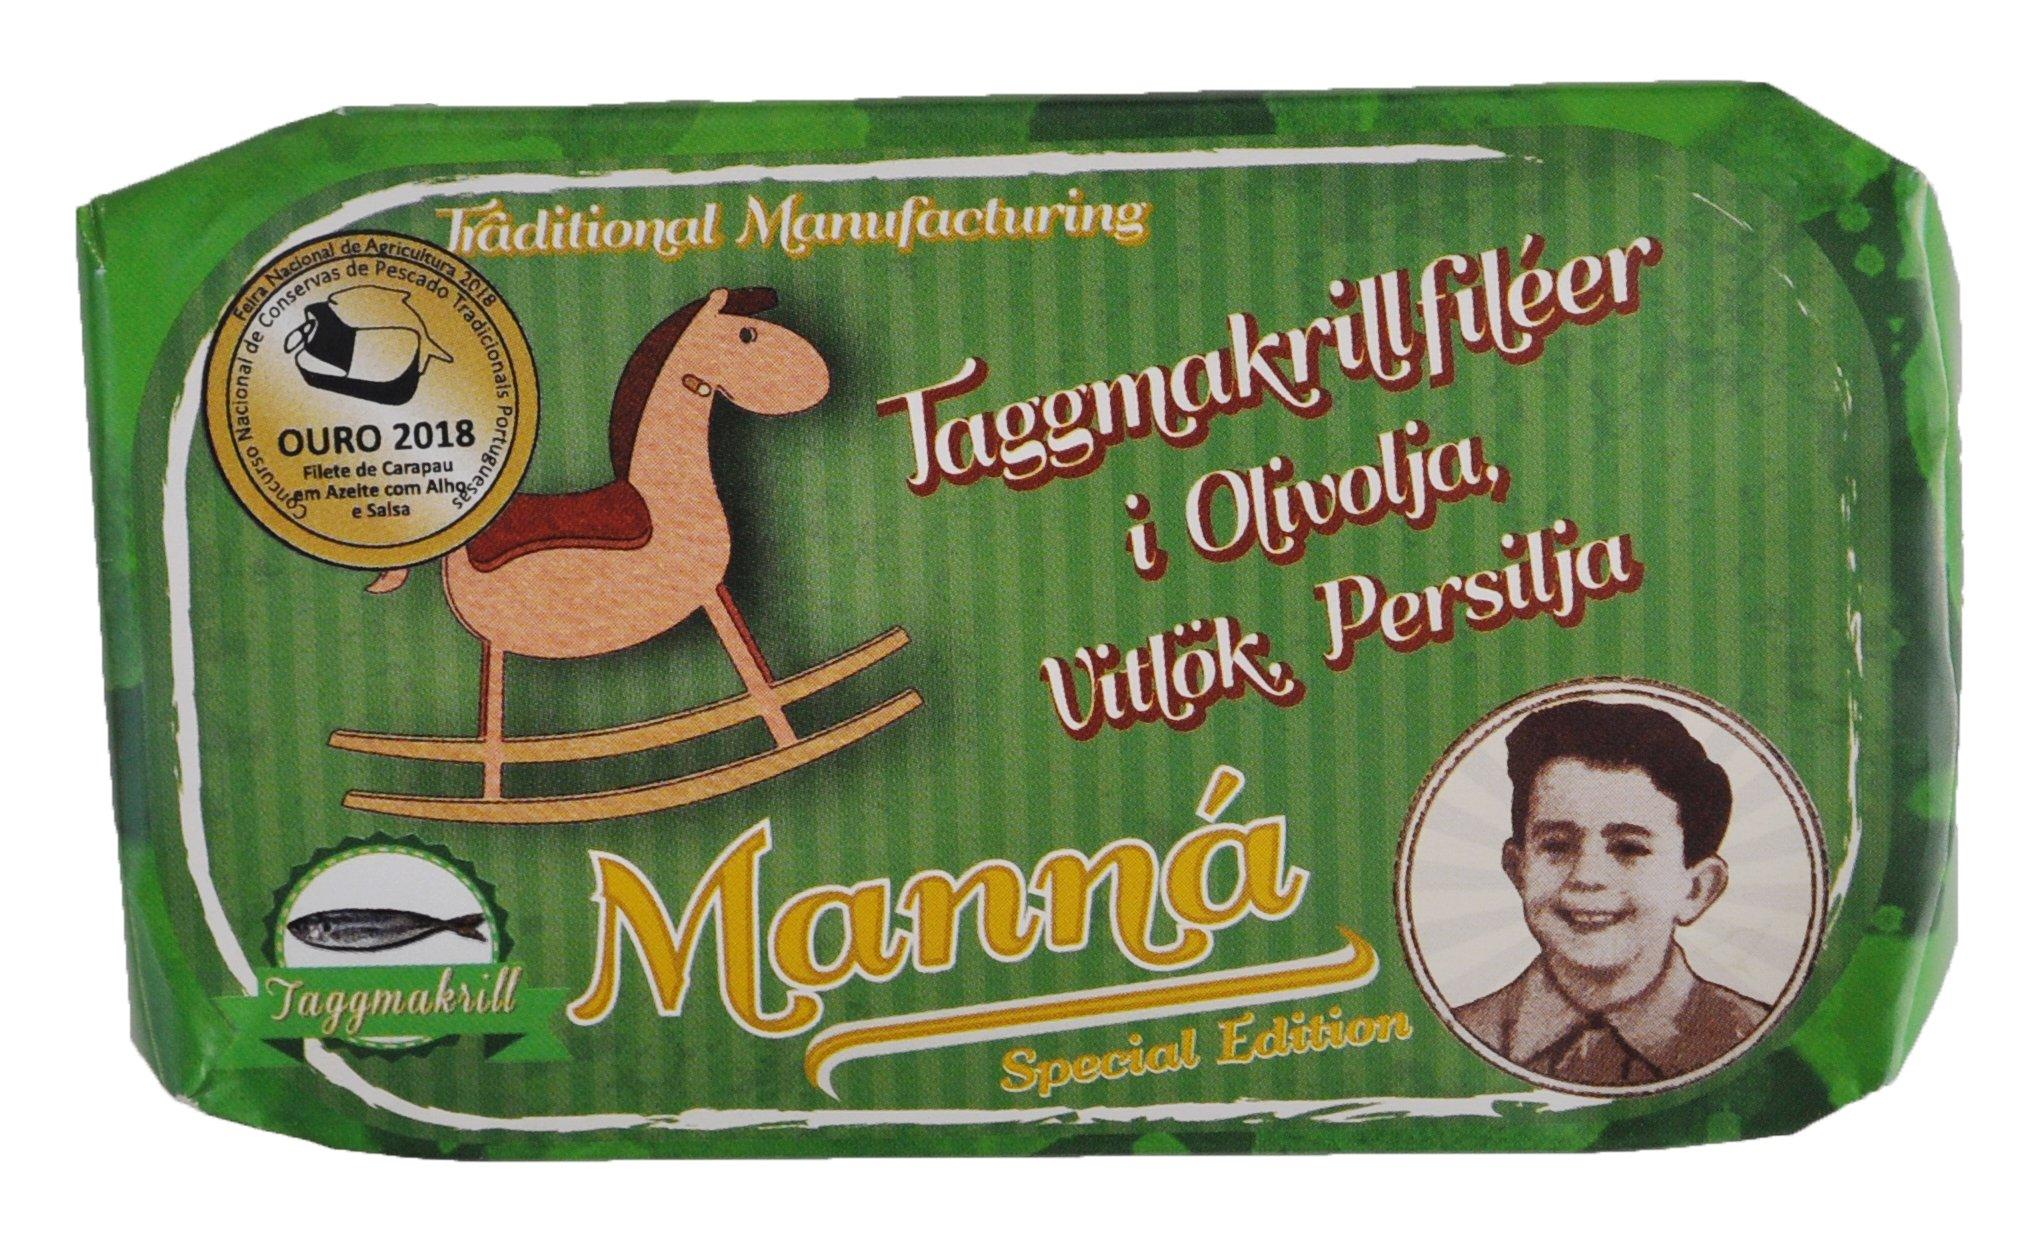 Taggmakrillfiléer i Olivolja, Vitlök & Persilja x 2